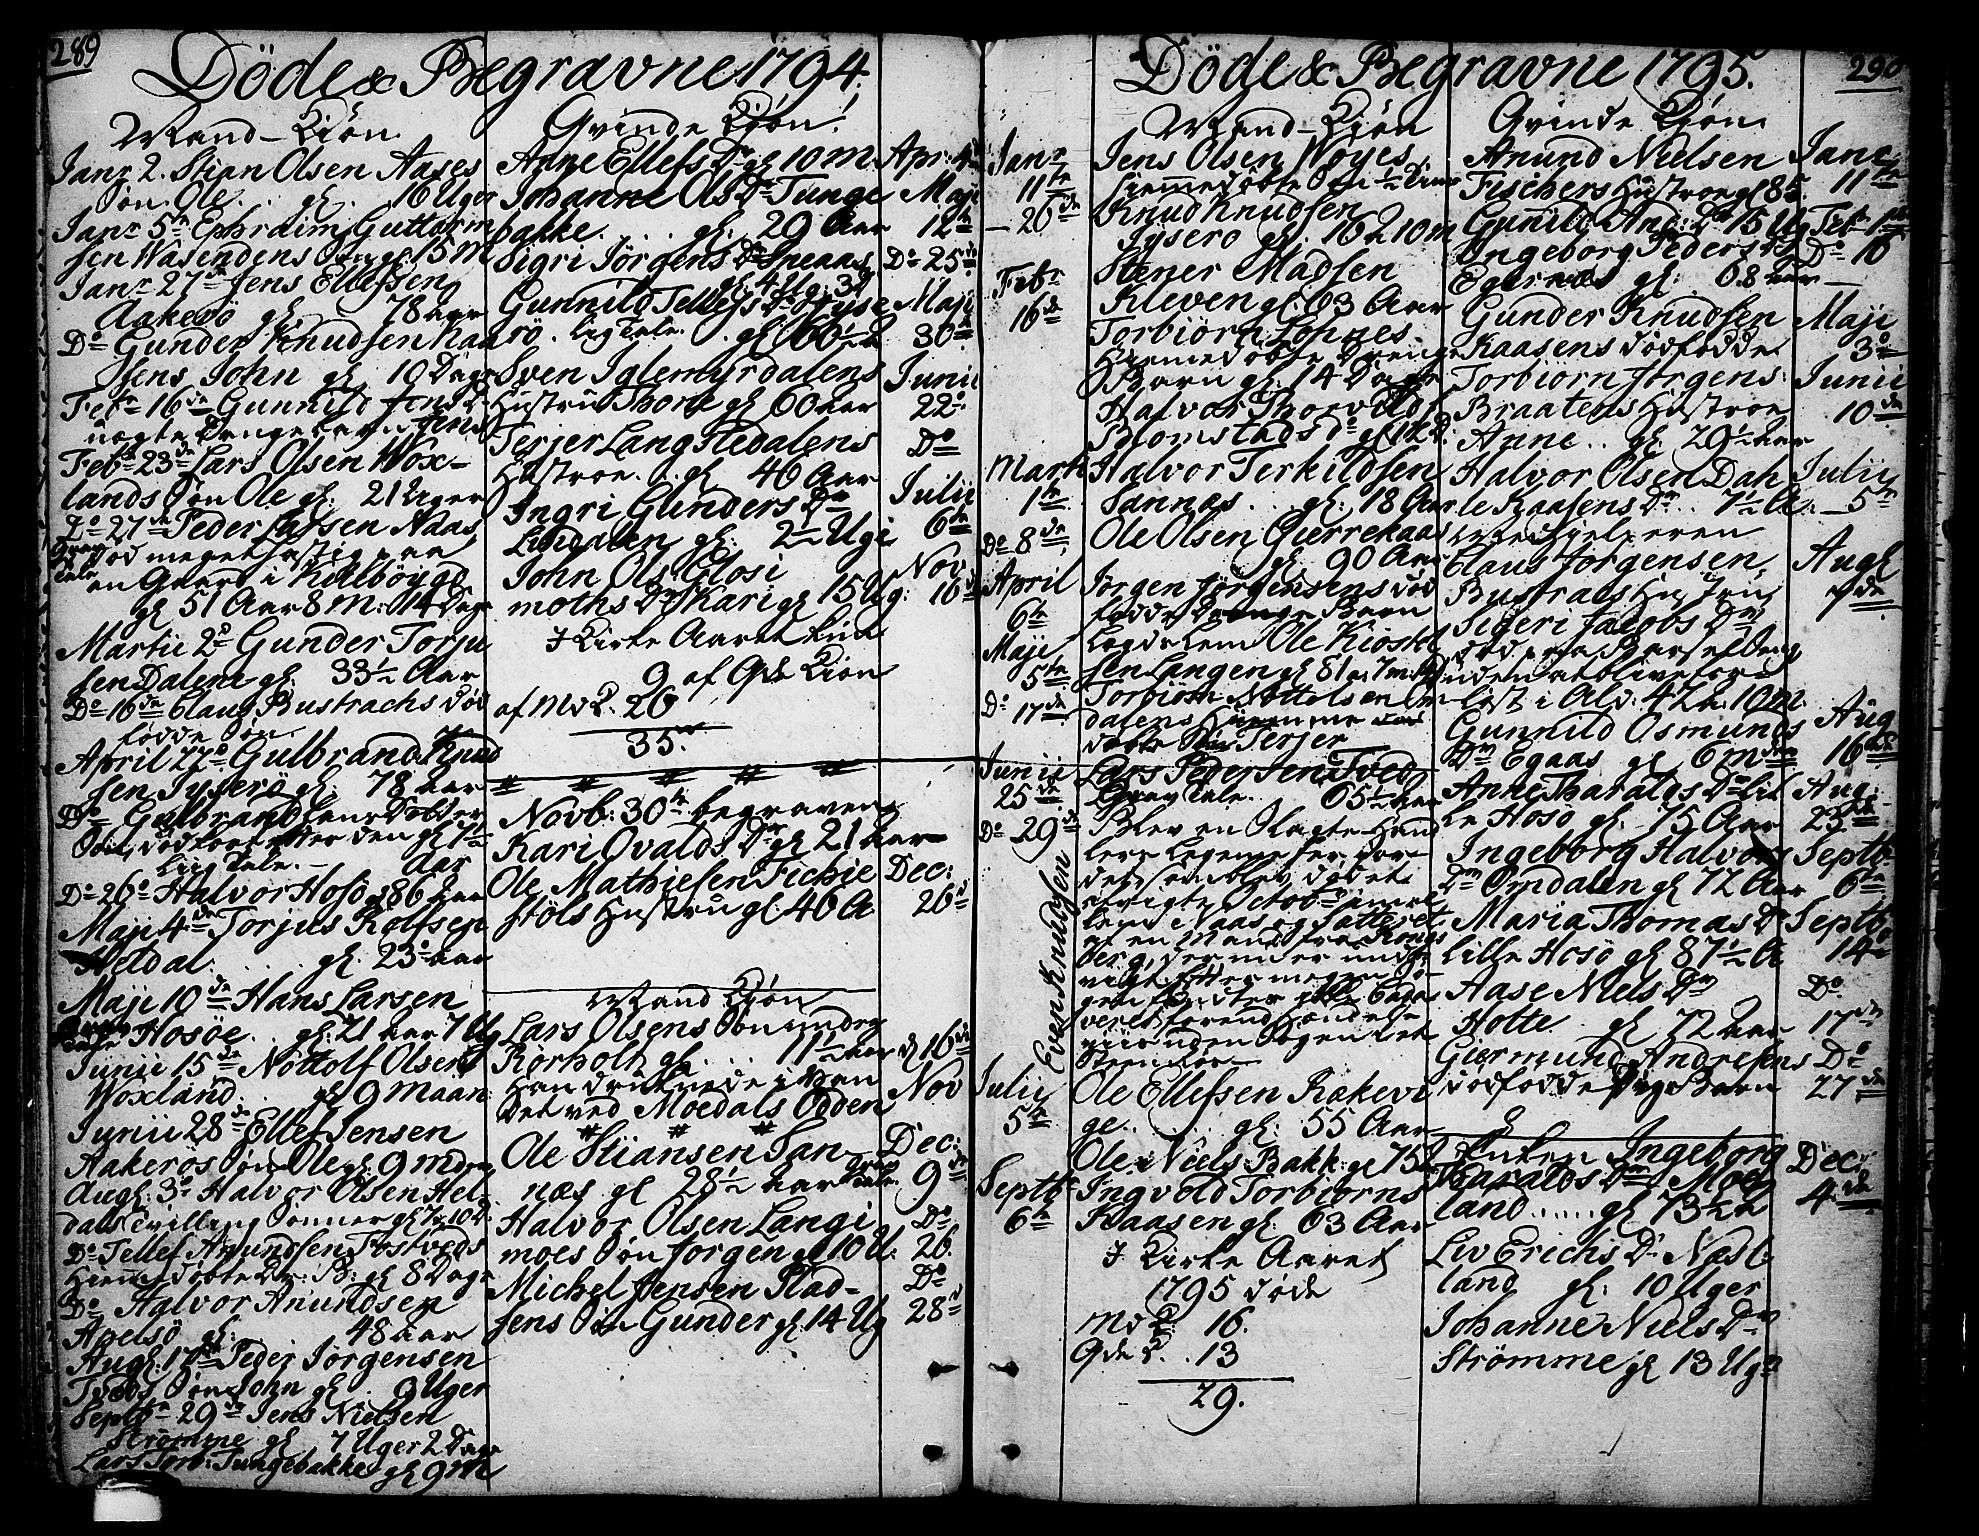 SAKO, Drangedal kirkebøker, F/Fa/L0003: Ministerialbok nr. 3, 1768-1814, s. 289-290